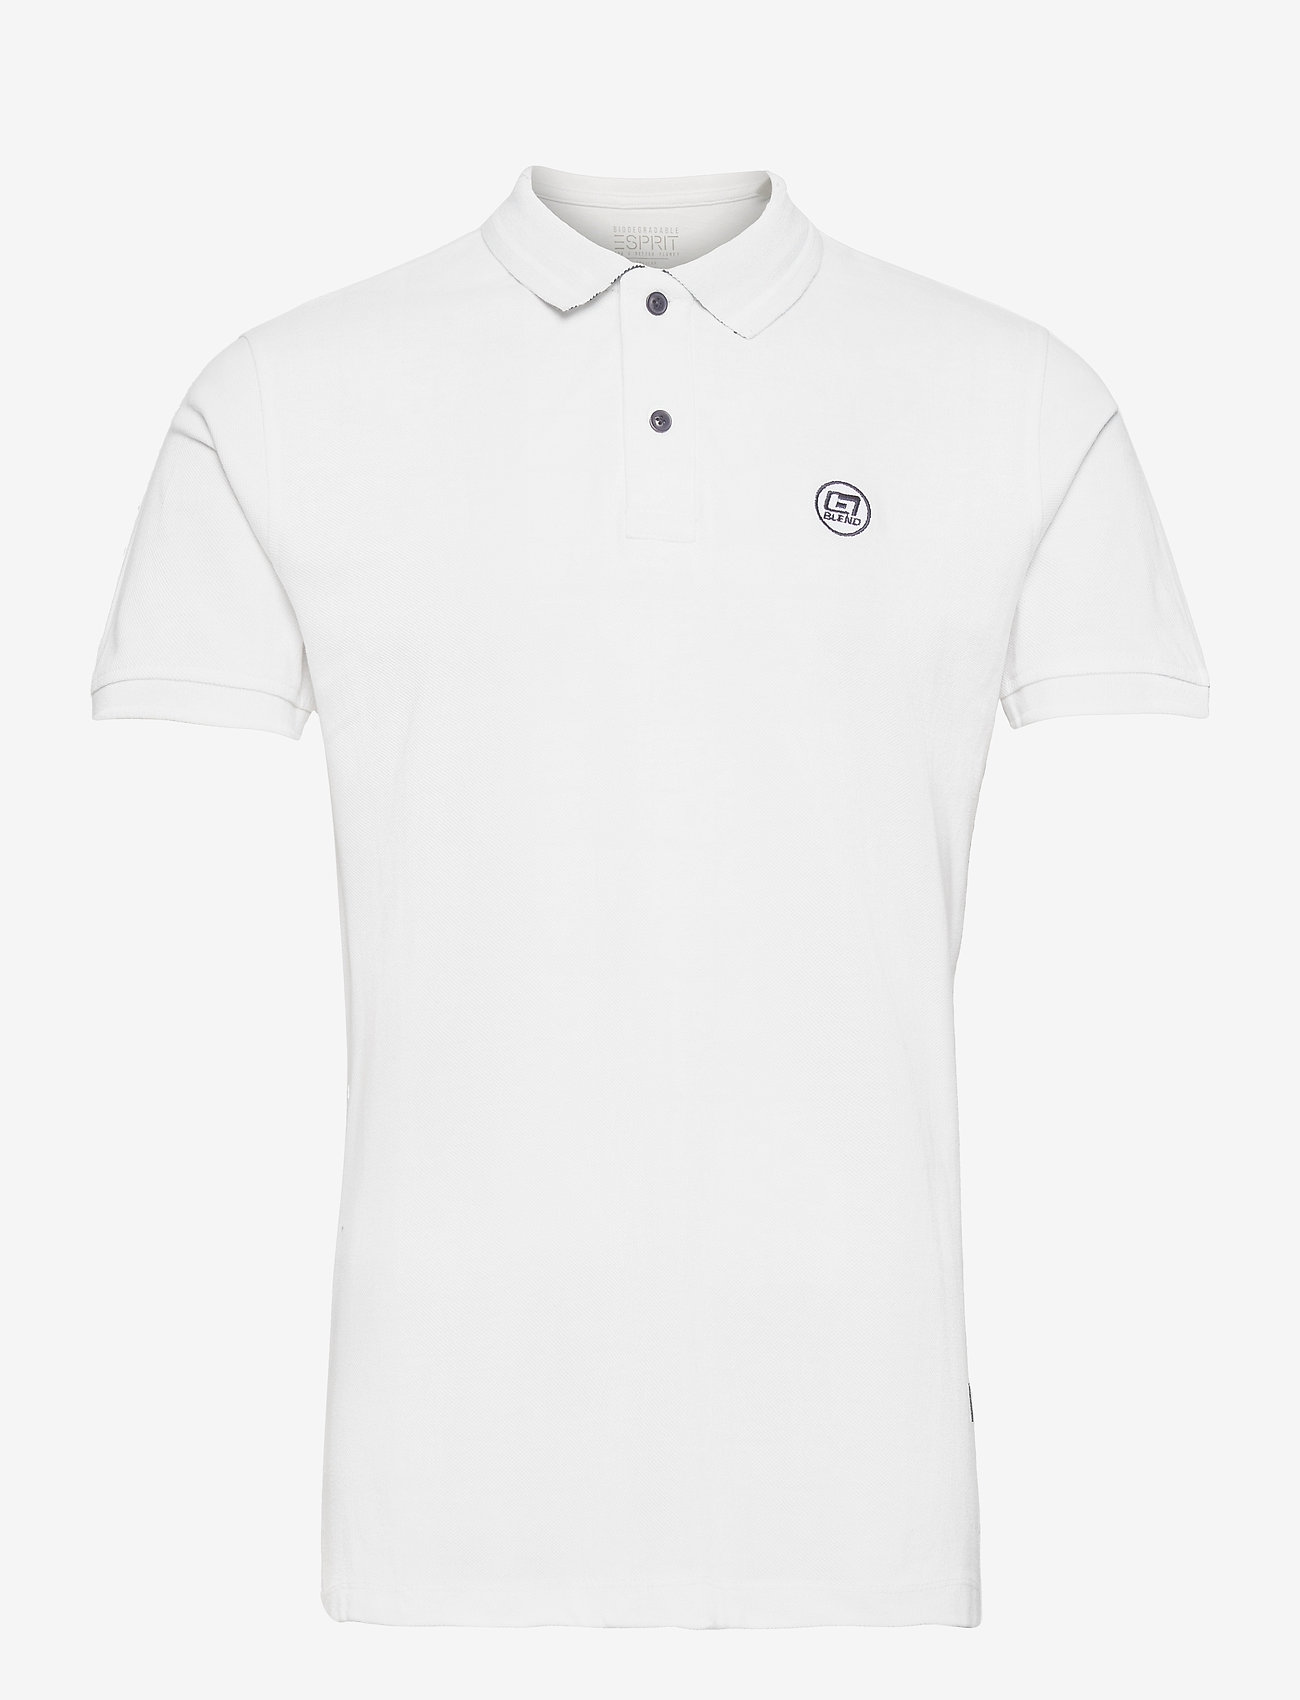 Blend - Poloshirt - krótki rękaw - bright white - 0